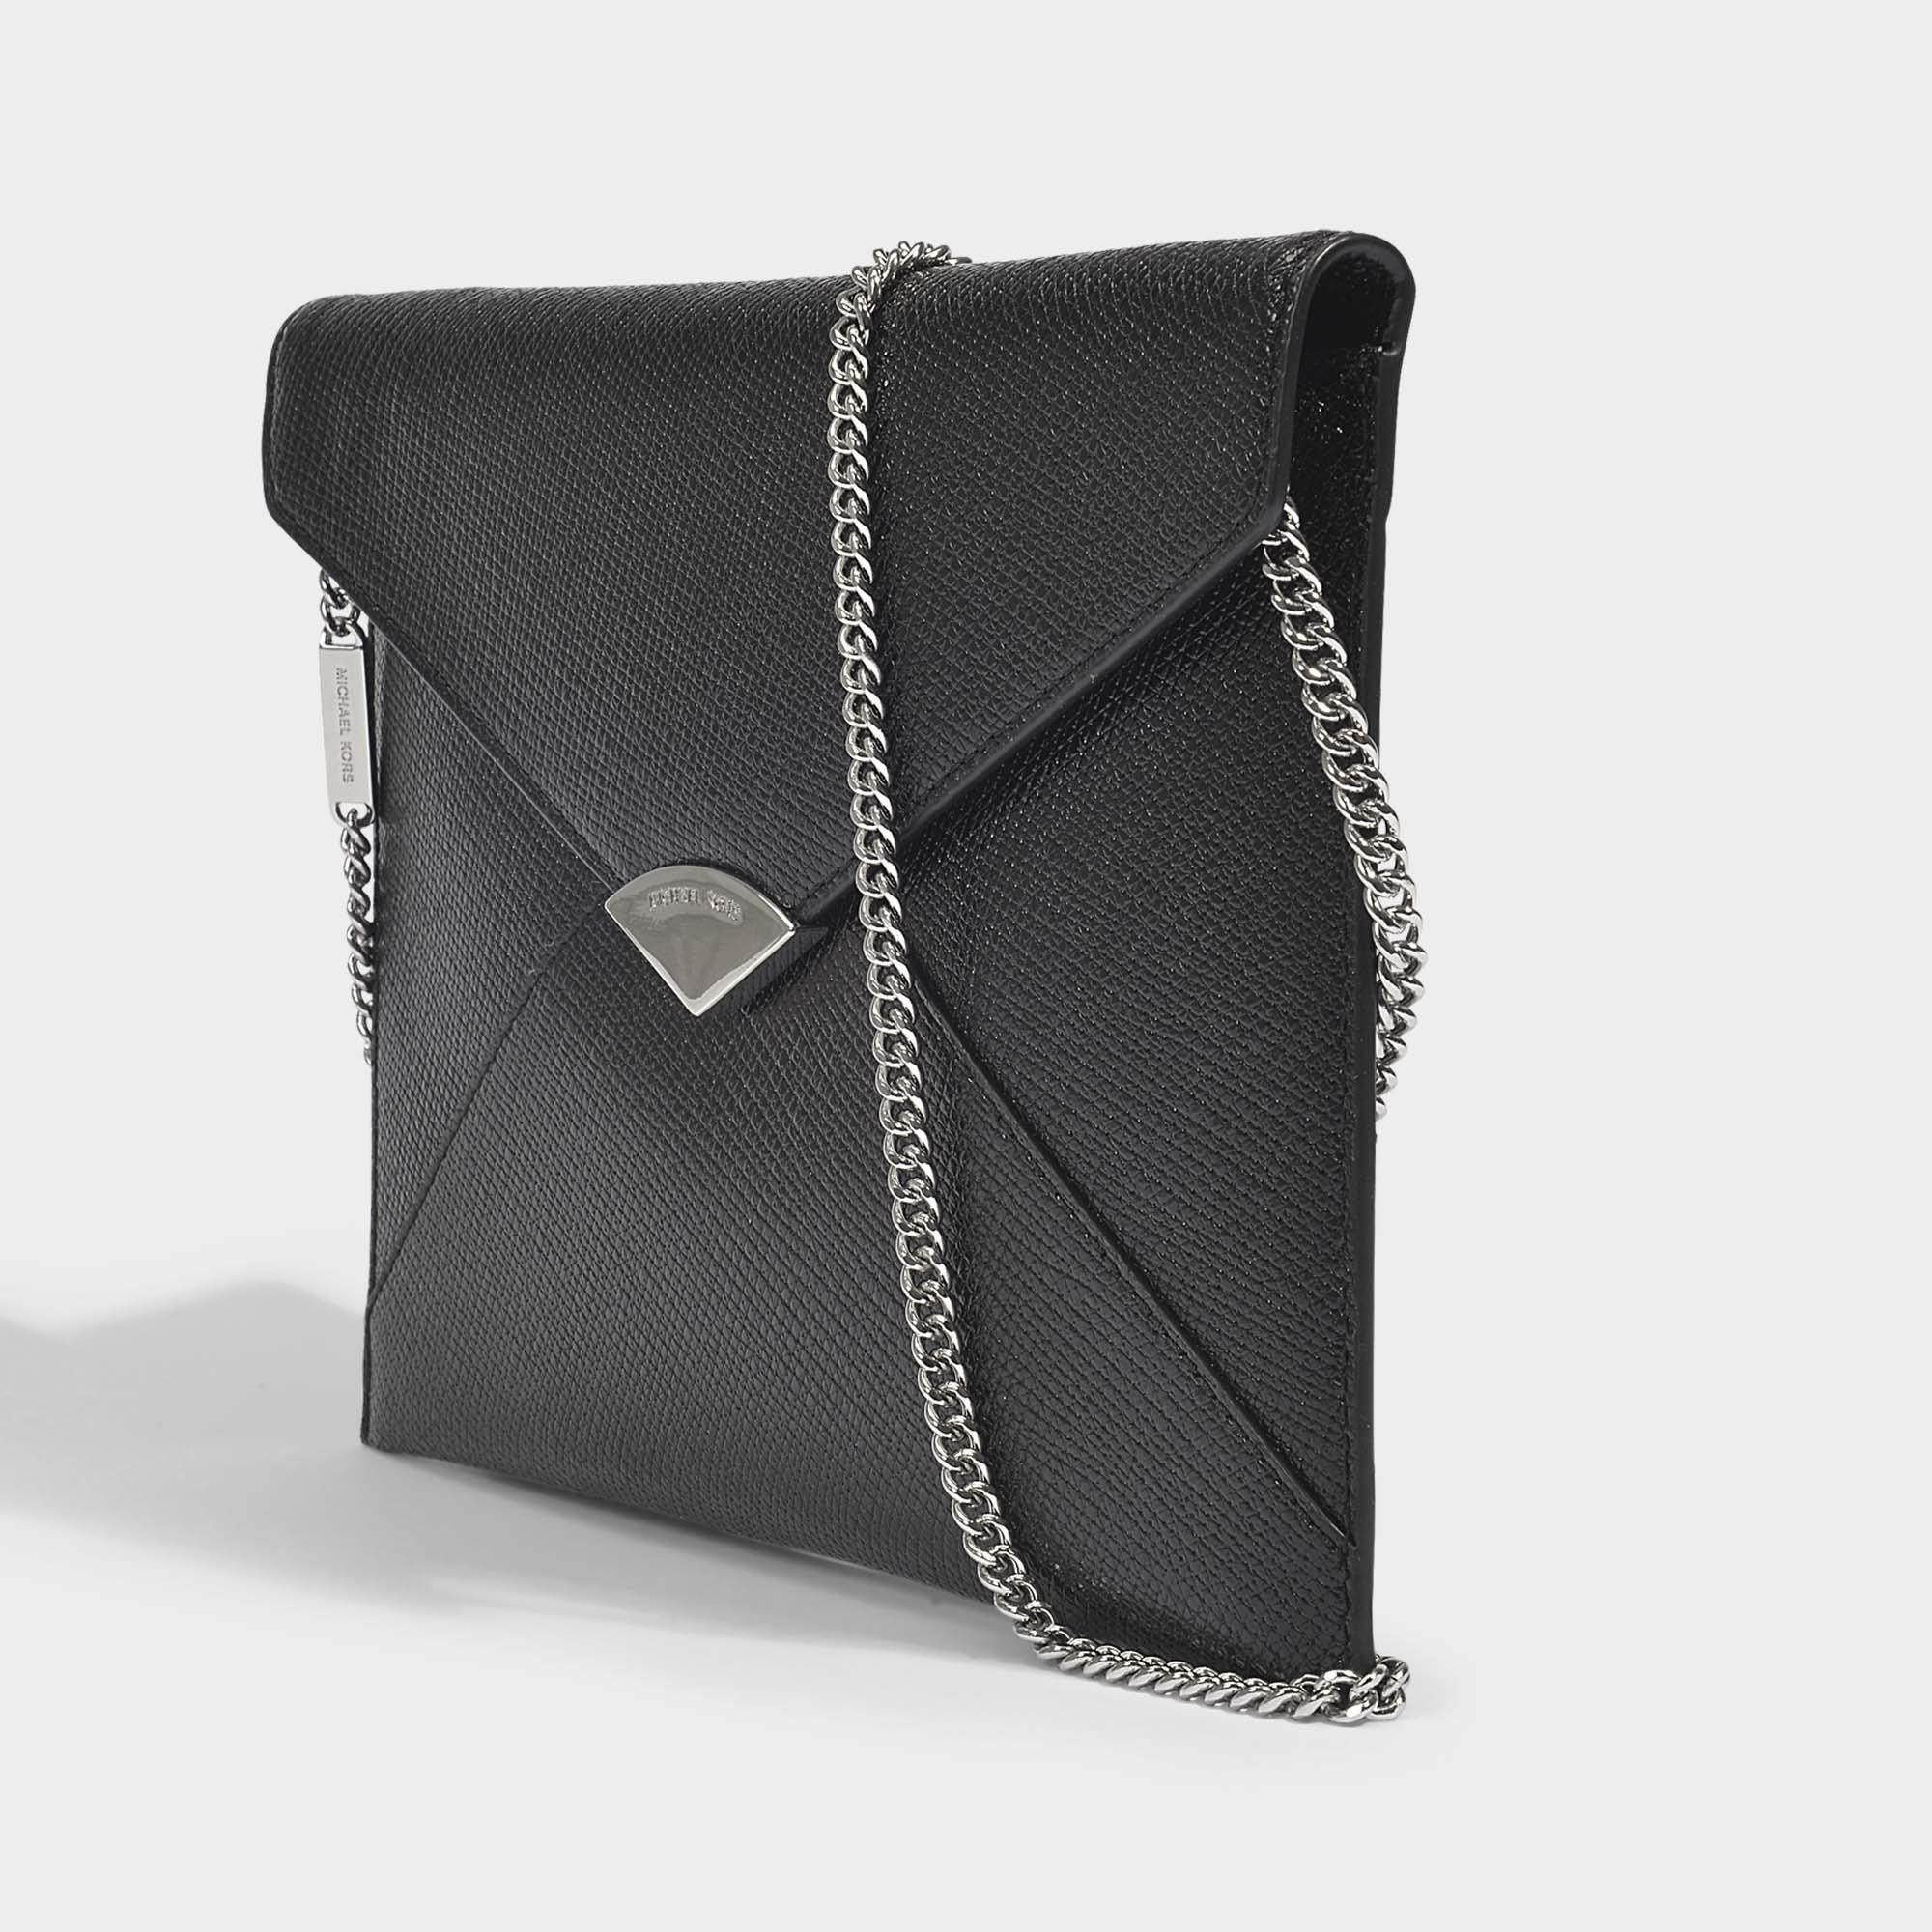 Barbara Large Soft Envelope Clutch in Black Metallic Calfskin Leather Michael Michael Kors OlJHBKnb